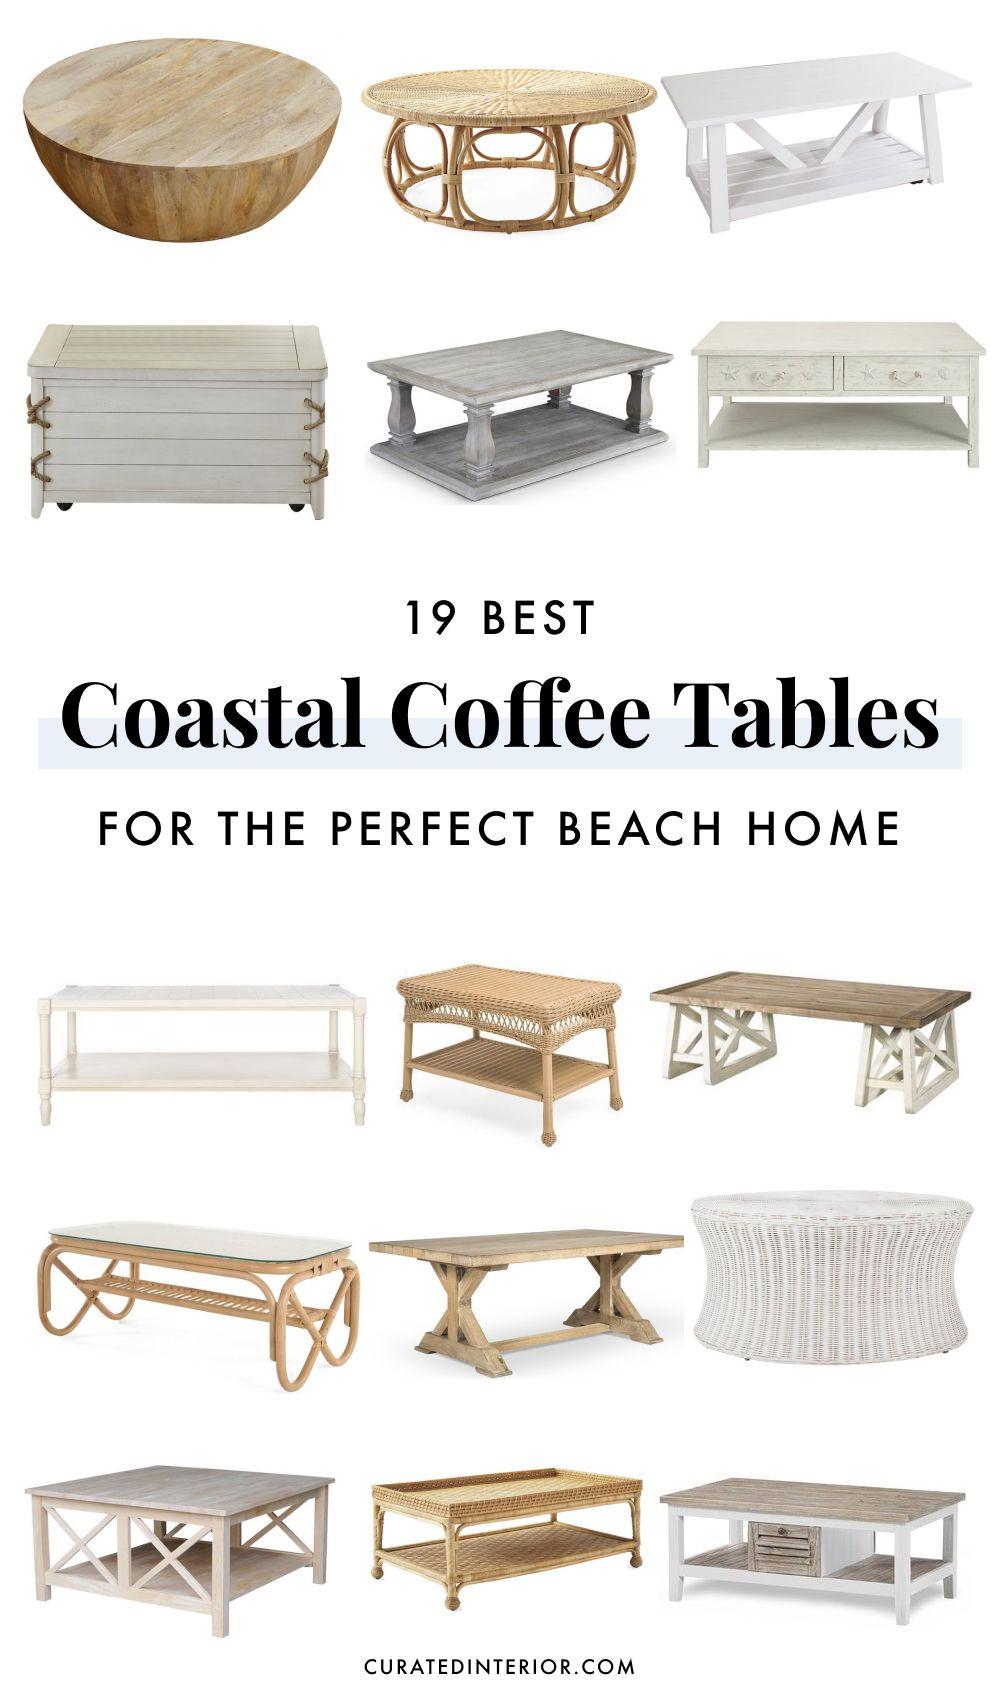 Best Coastal Coffee Tables